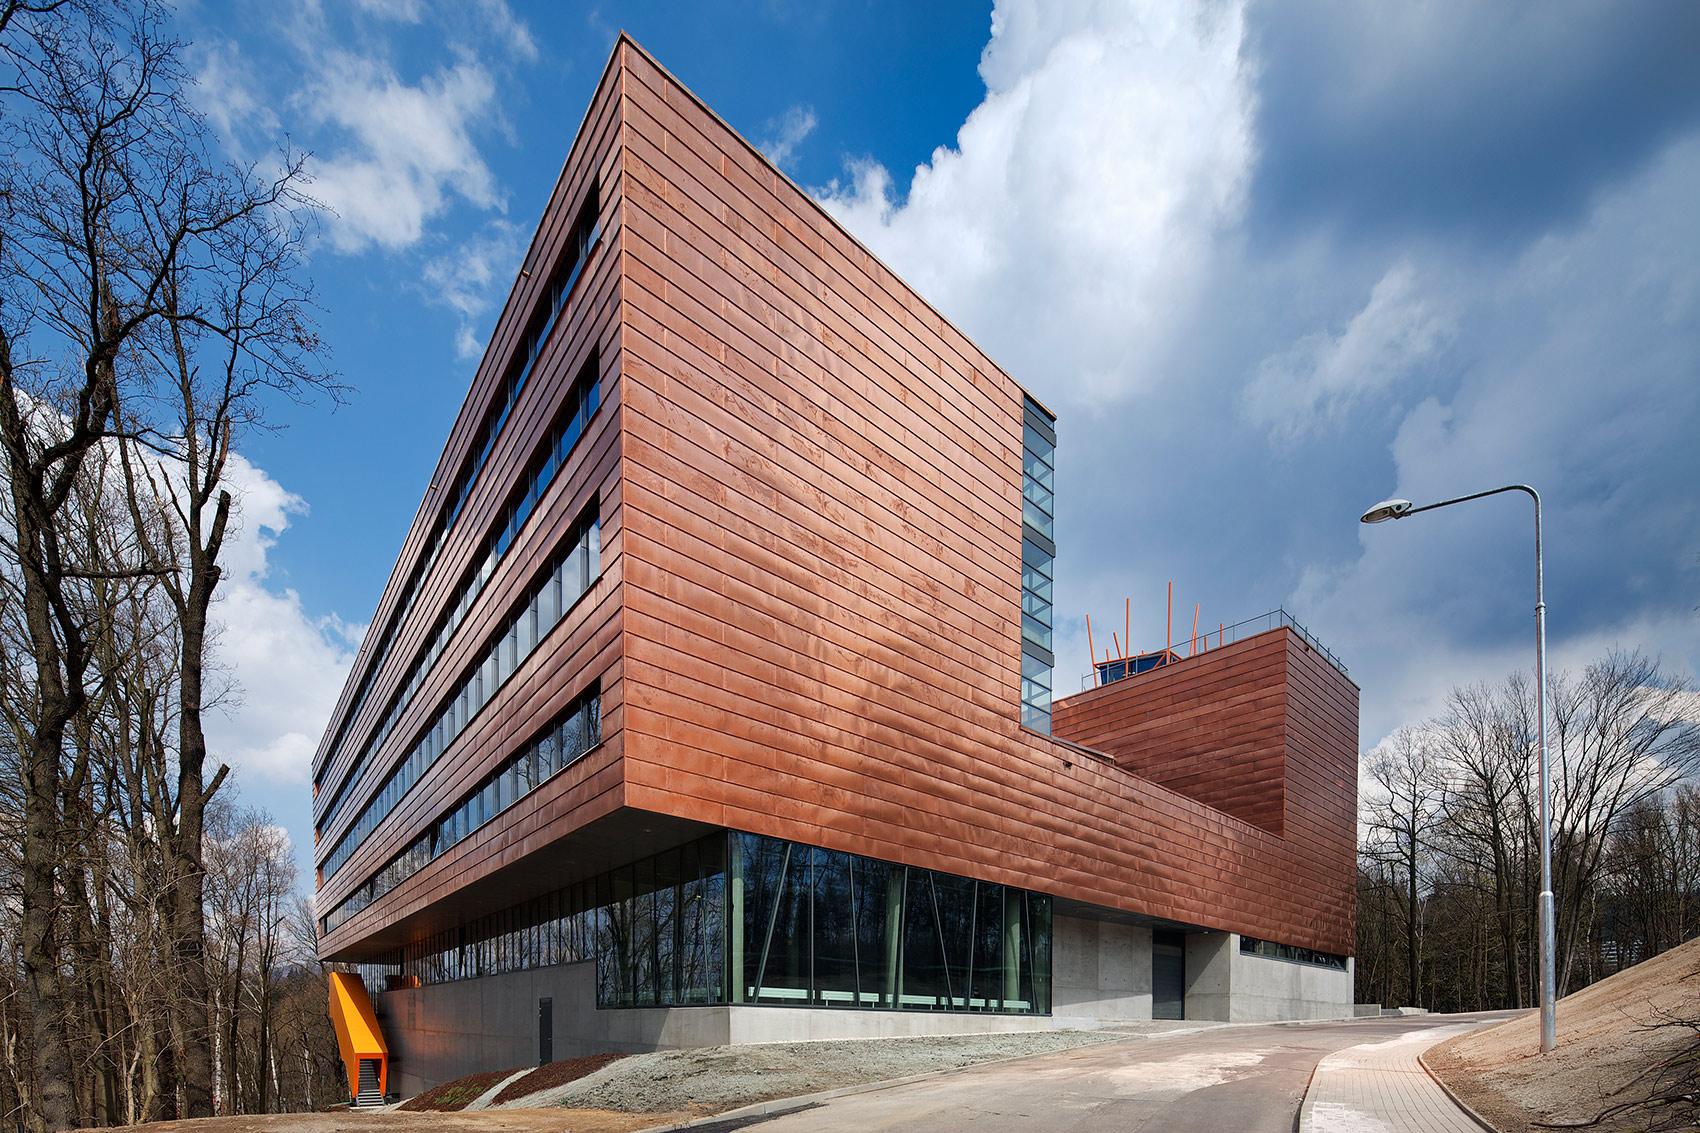 Technická univerzita v Liberci - Aleš Jungmann